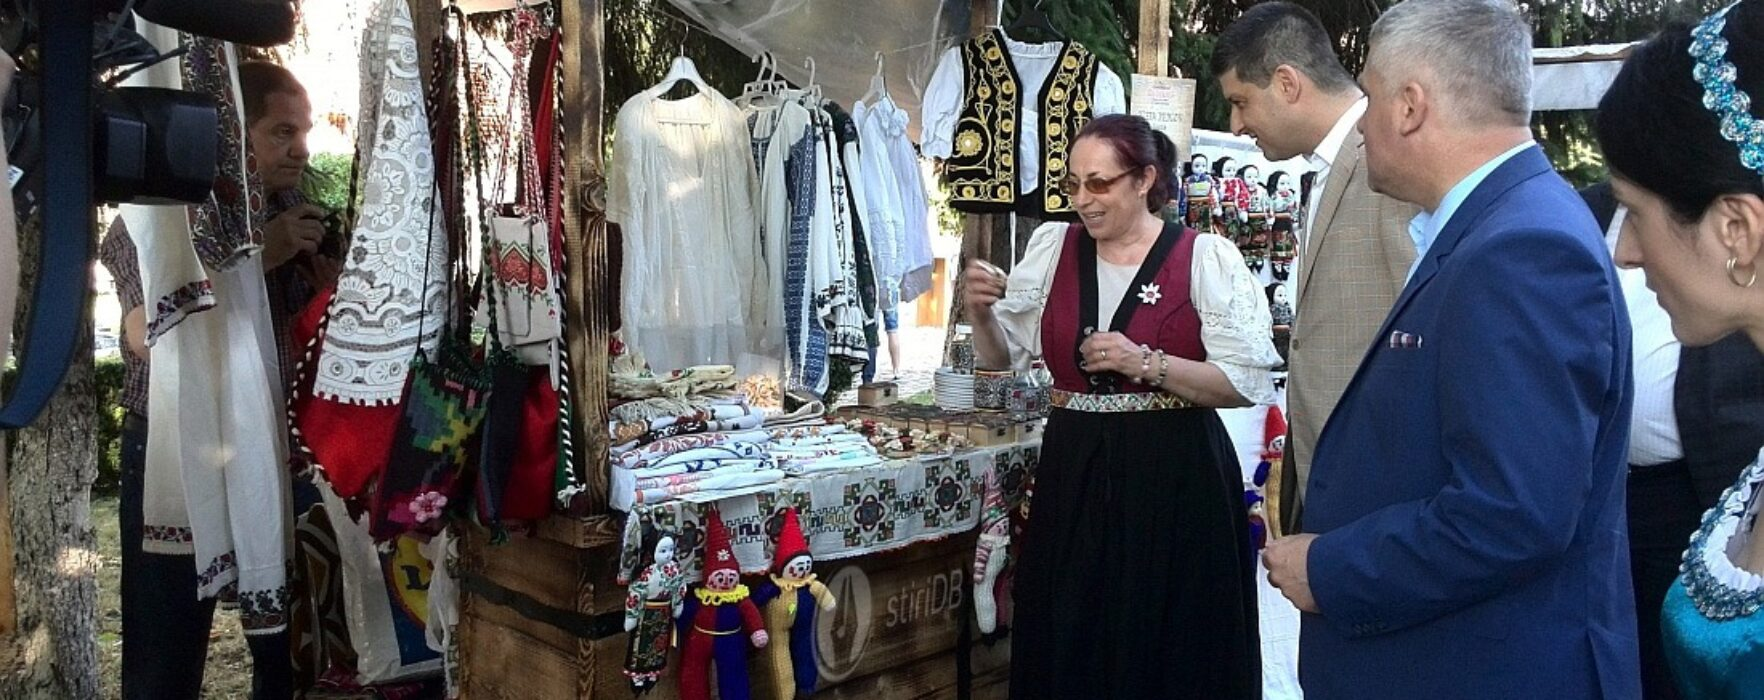 "Târg medieval la Târgovişte, ""Negustori la poarta cetăţii"" (foto)"